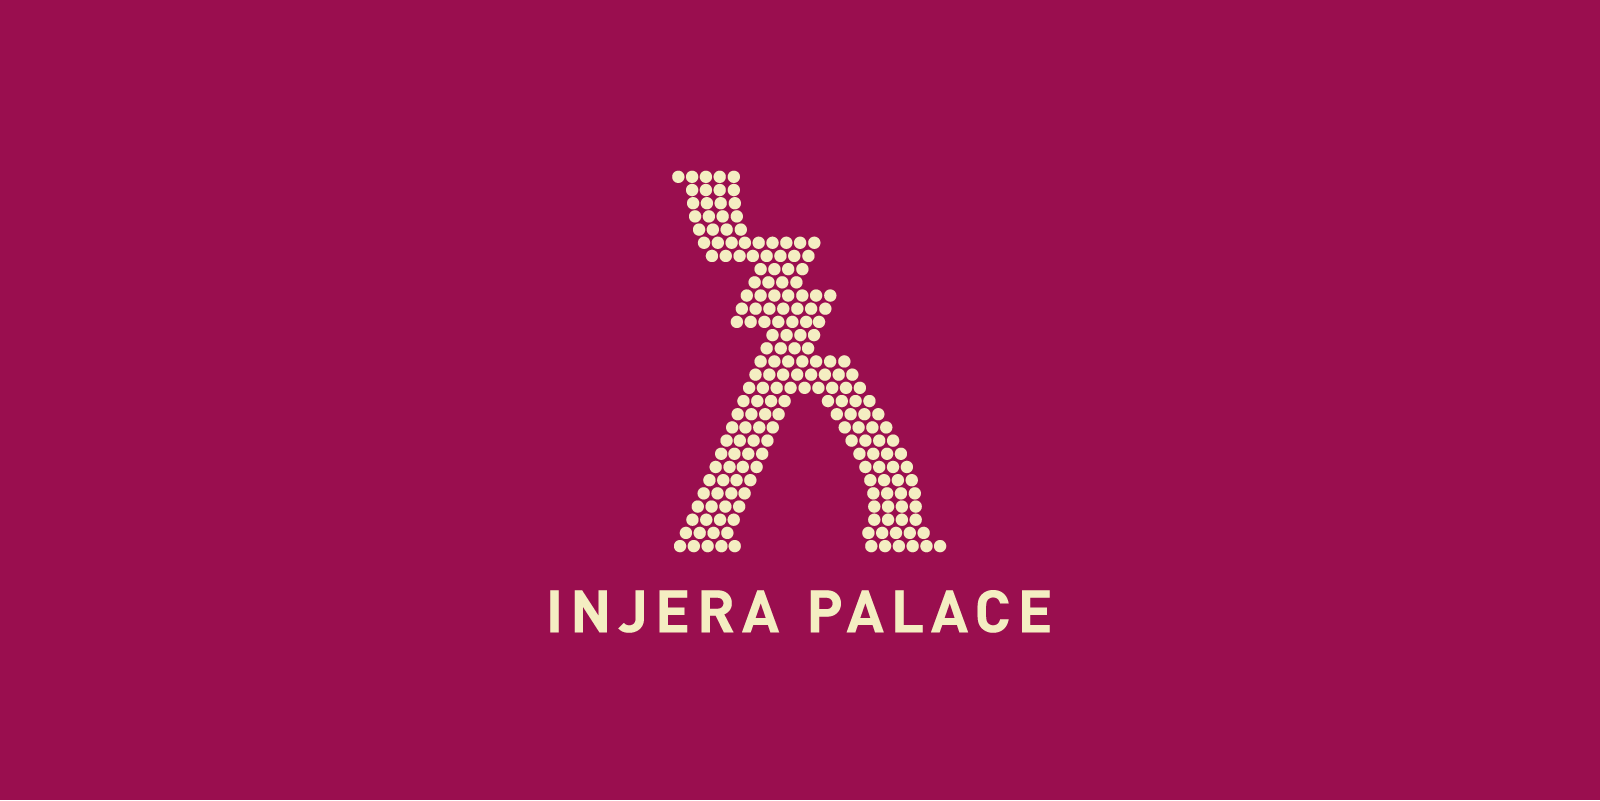 Injera Palace – logo